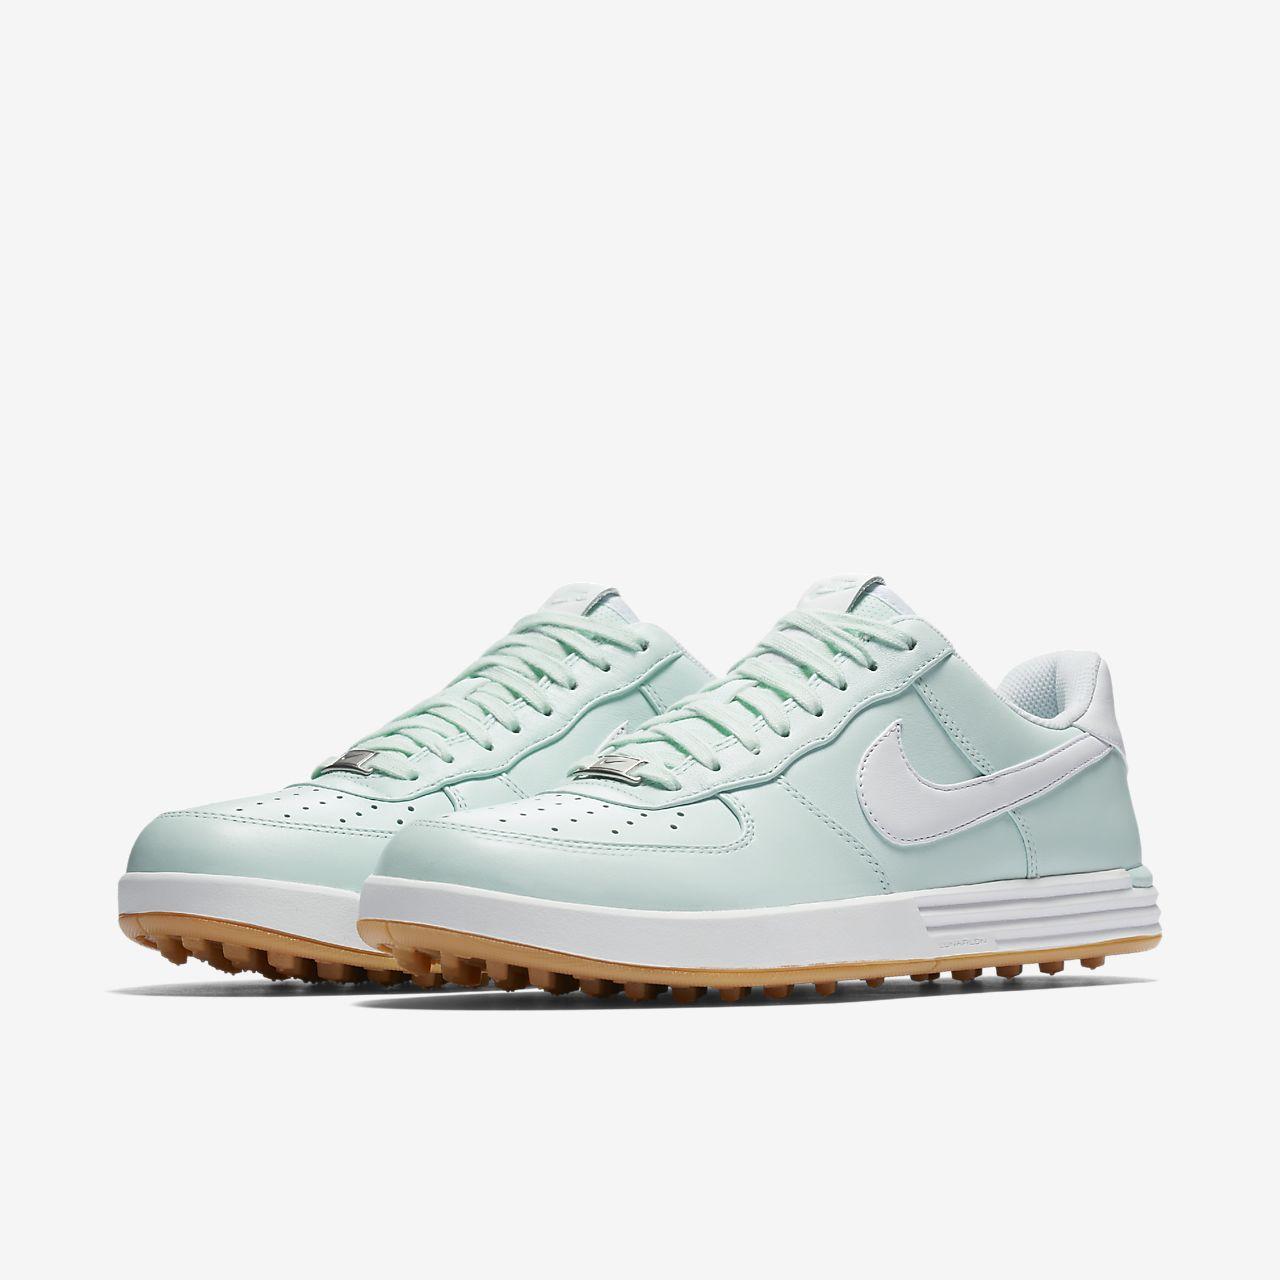 ... Nike Lunar Force 1 G Mens Golf Shoe